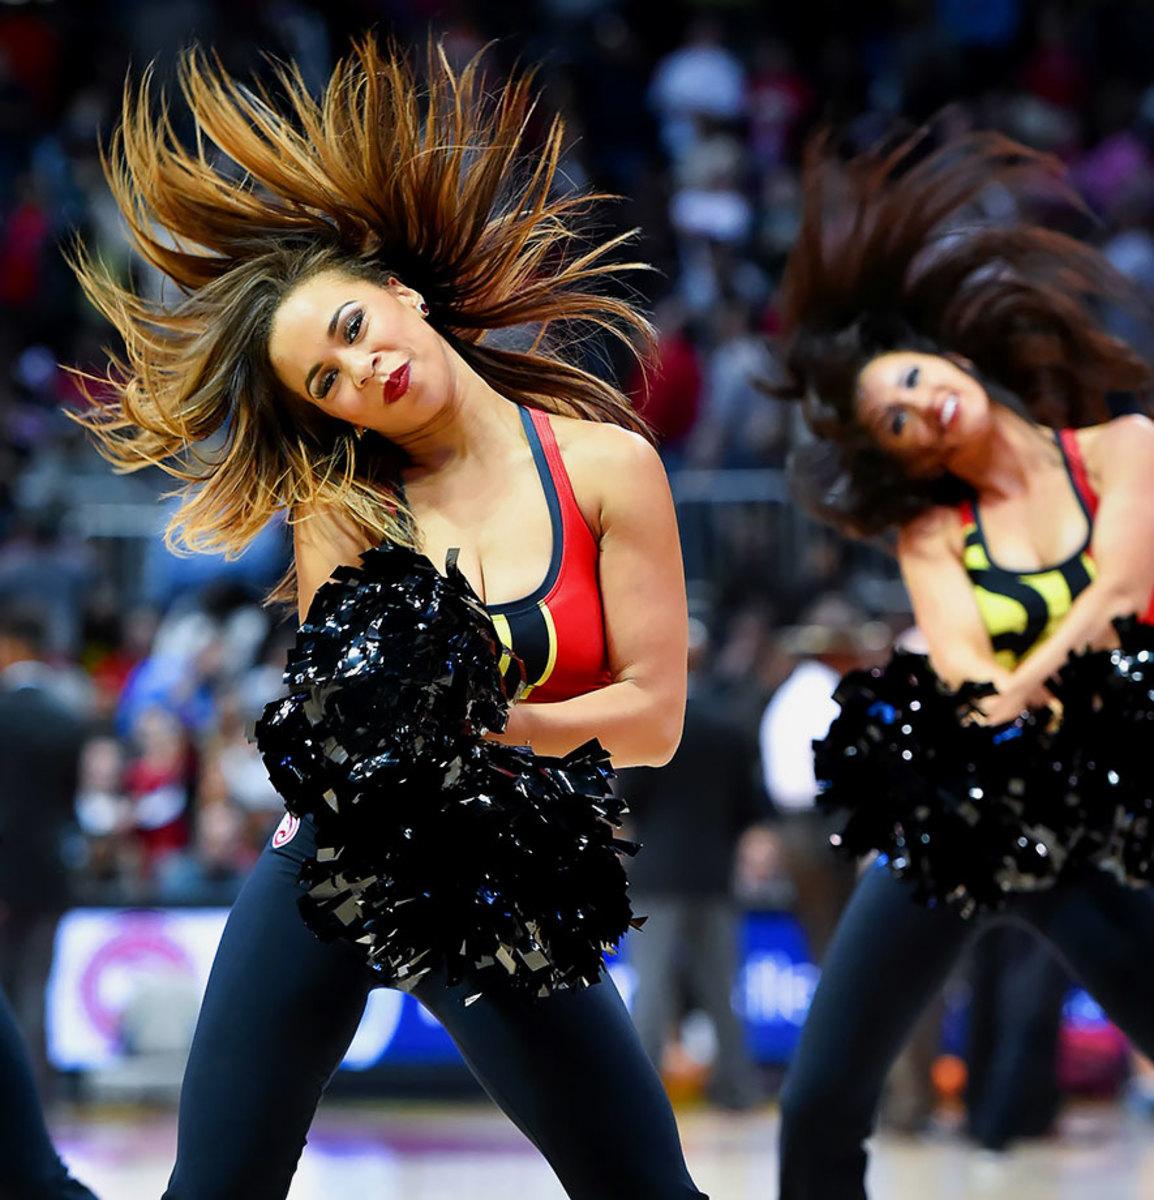 Atlanta-Hawks-Cheerleaders-8346f1abb7fb42f4915d75cdda98328f-0.jpg